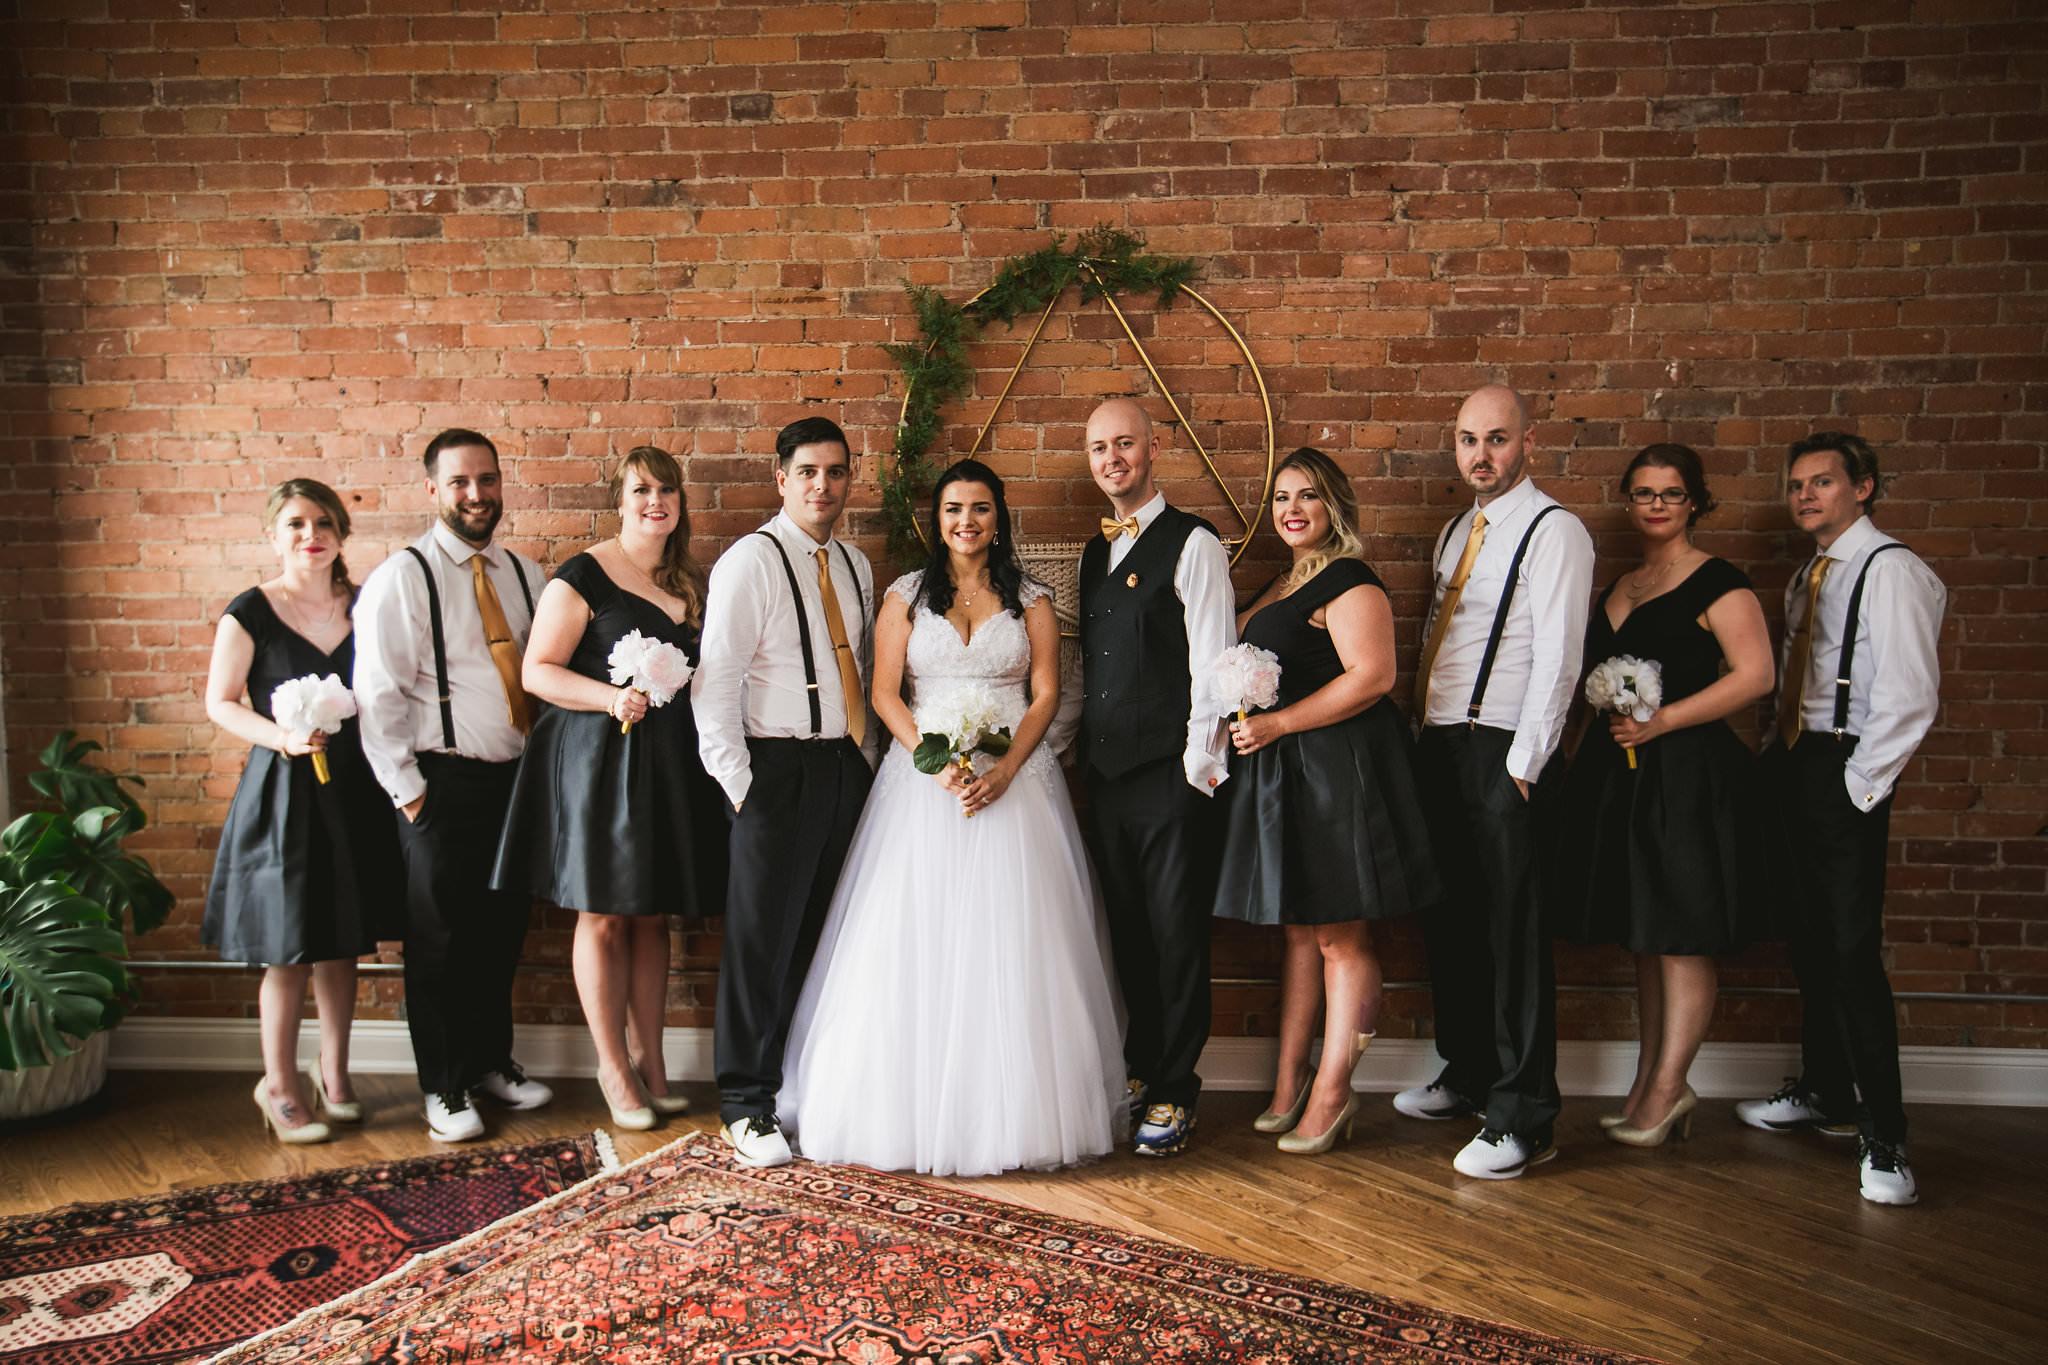 Kristen Adam Kindred Loft Whitby Wedding Photos 265 - Durham Wedding Photographer: Kindred Loft Wedding Photos